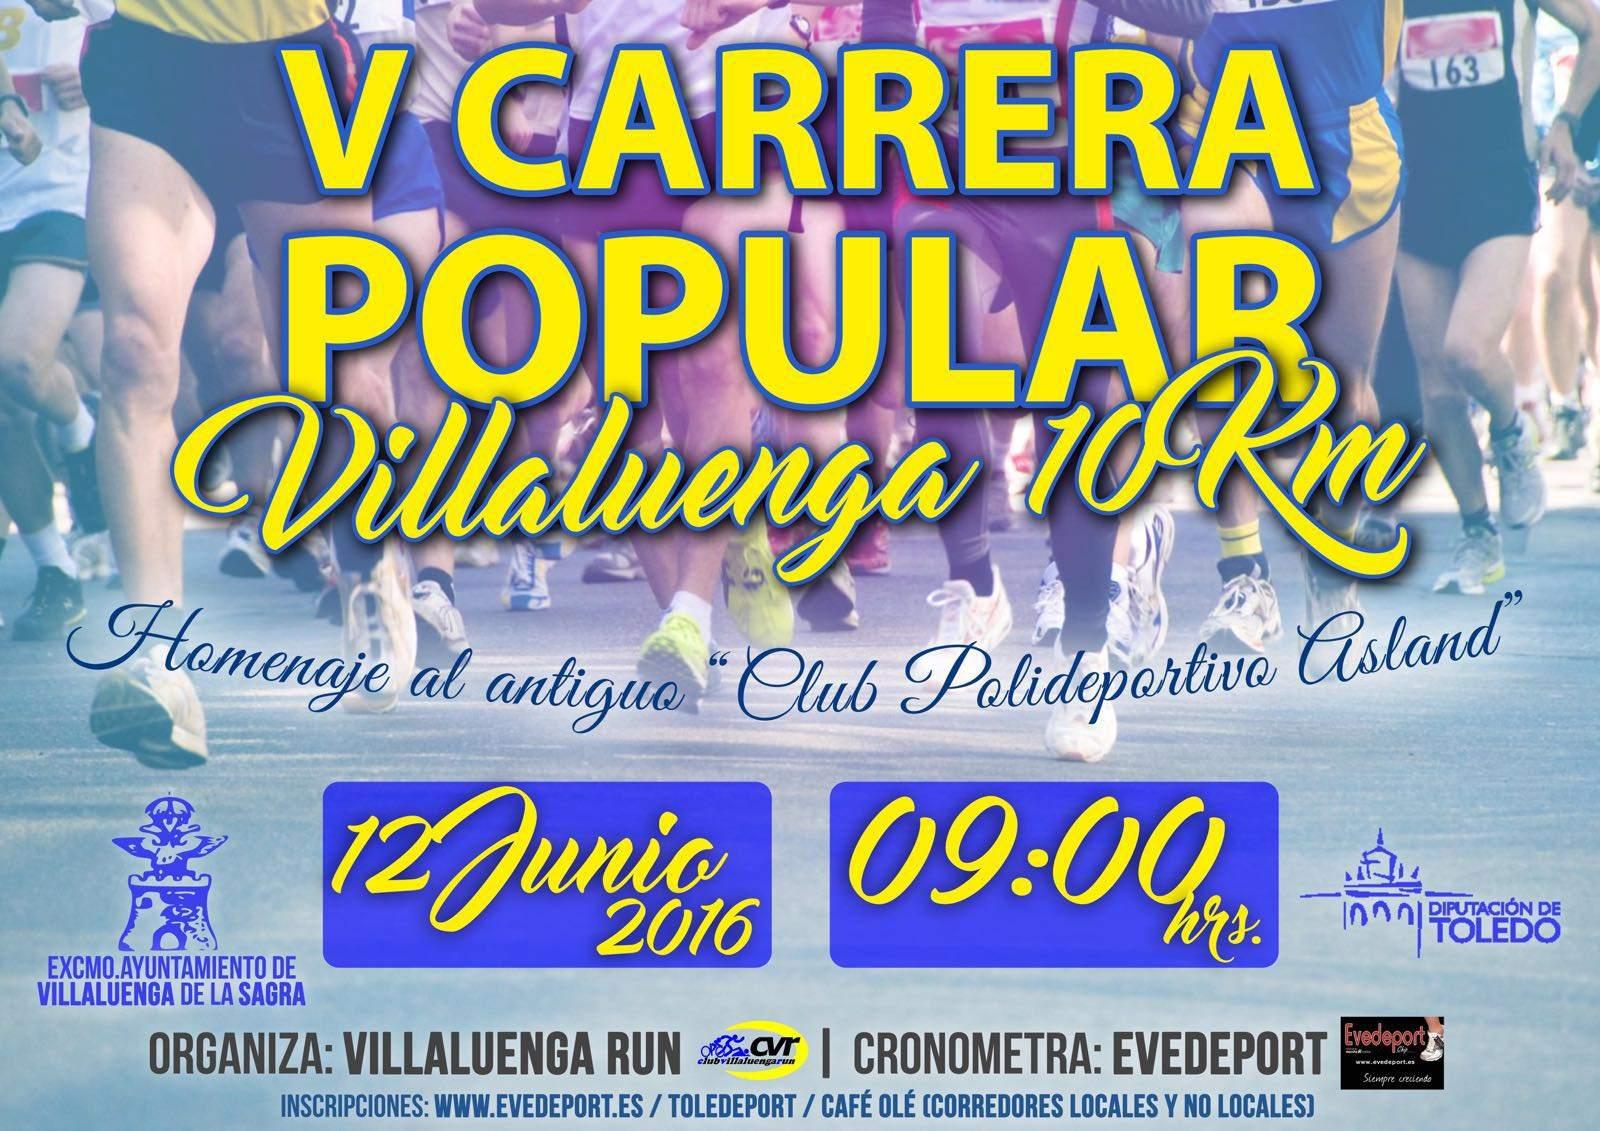 V CARRERA POPULAR VILLALUENGA DE LA SAGRA - Inscríbete